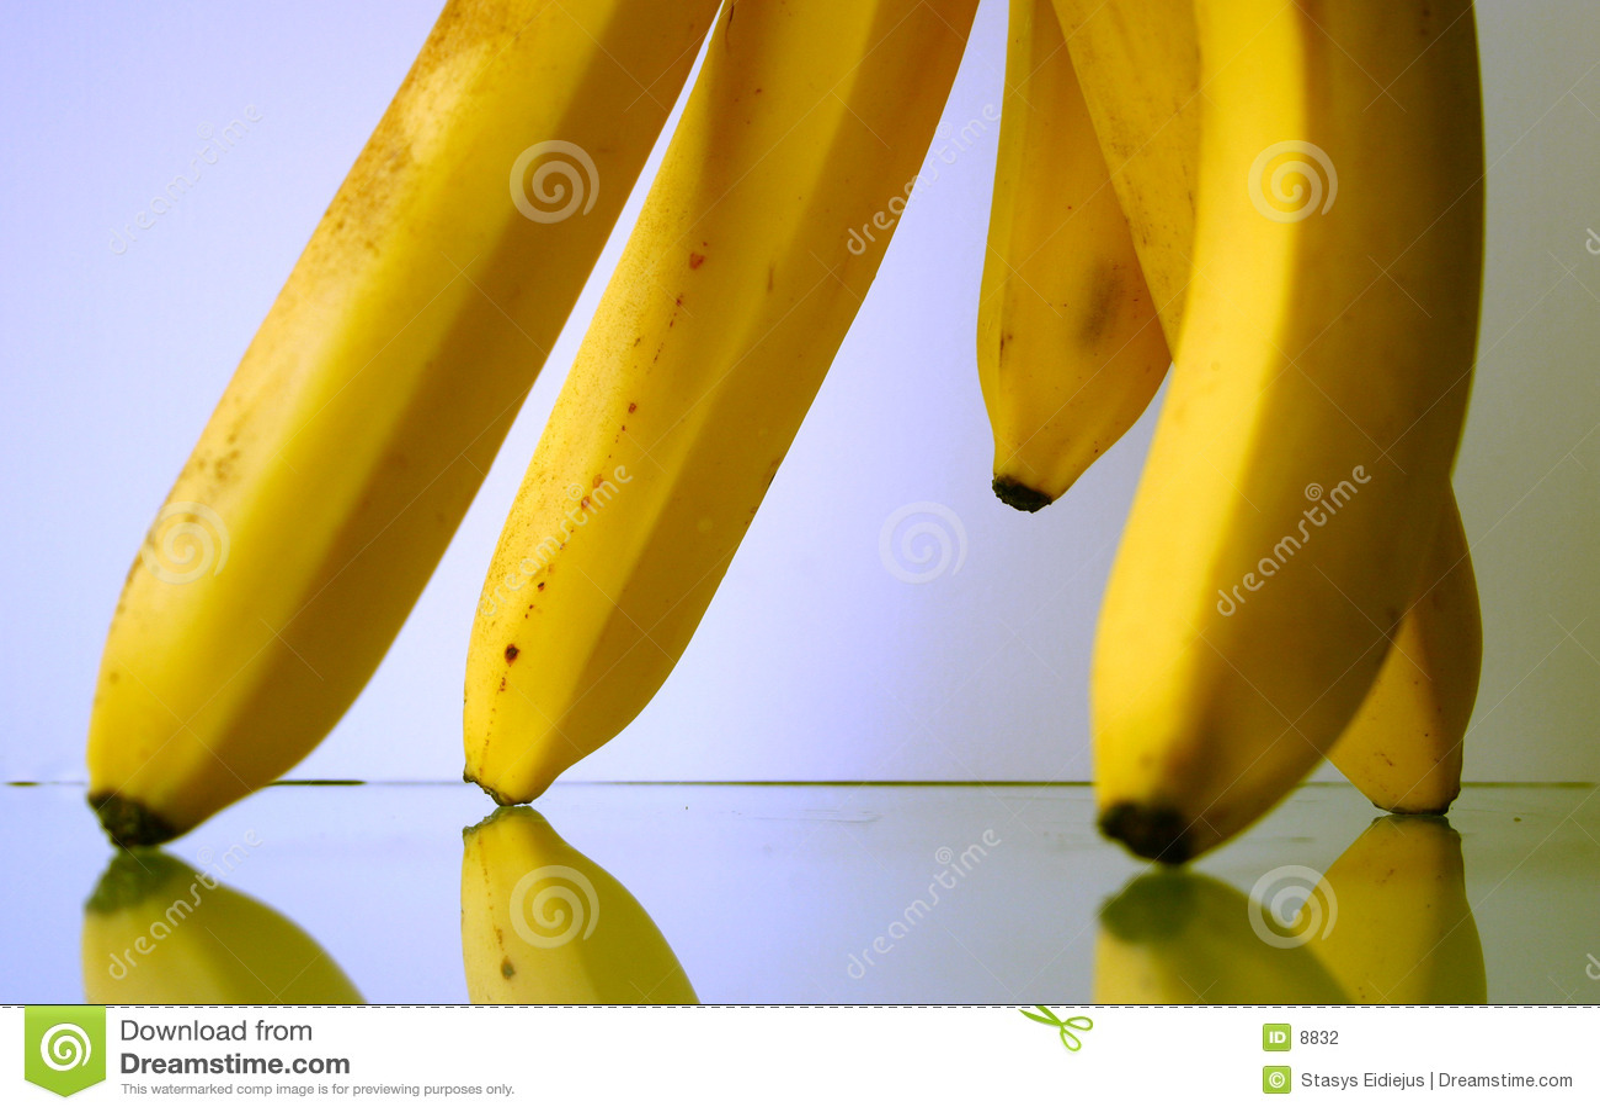 Bananer ii ståtar